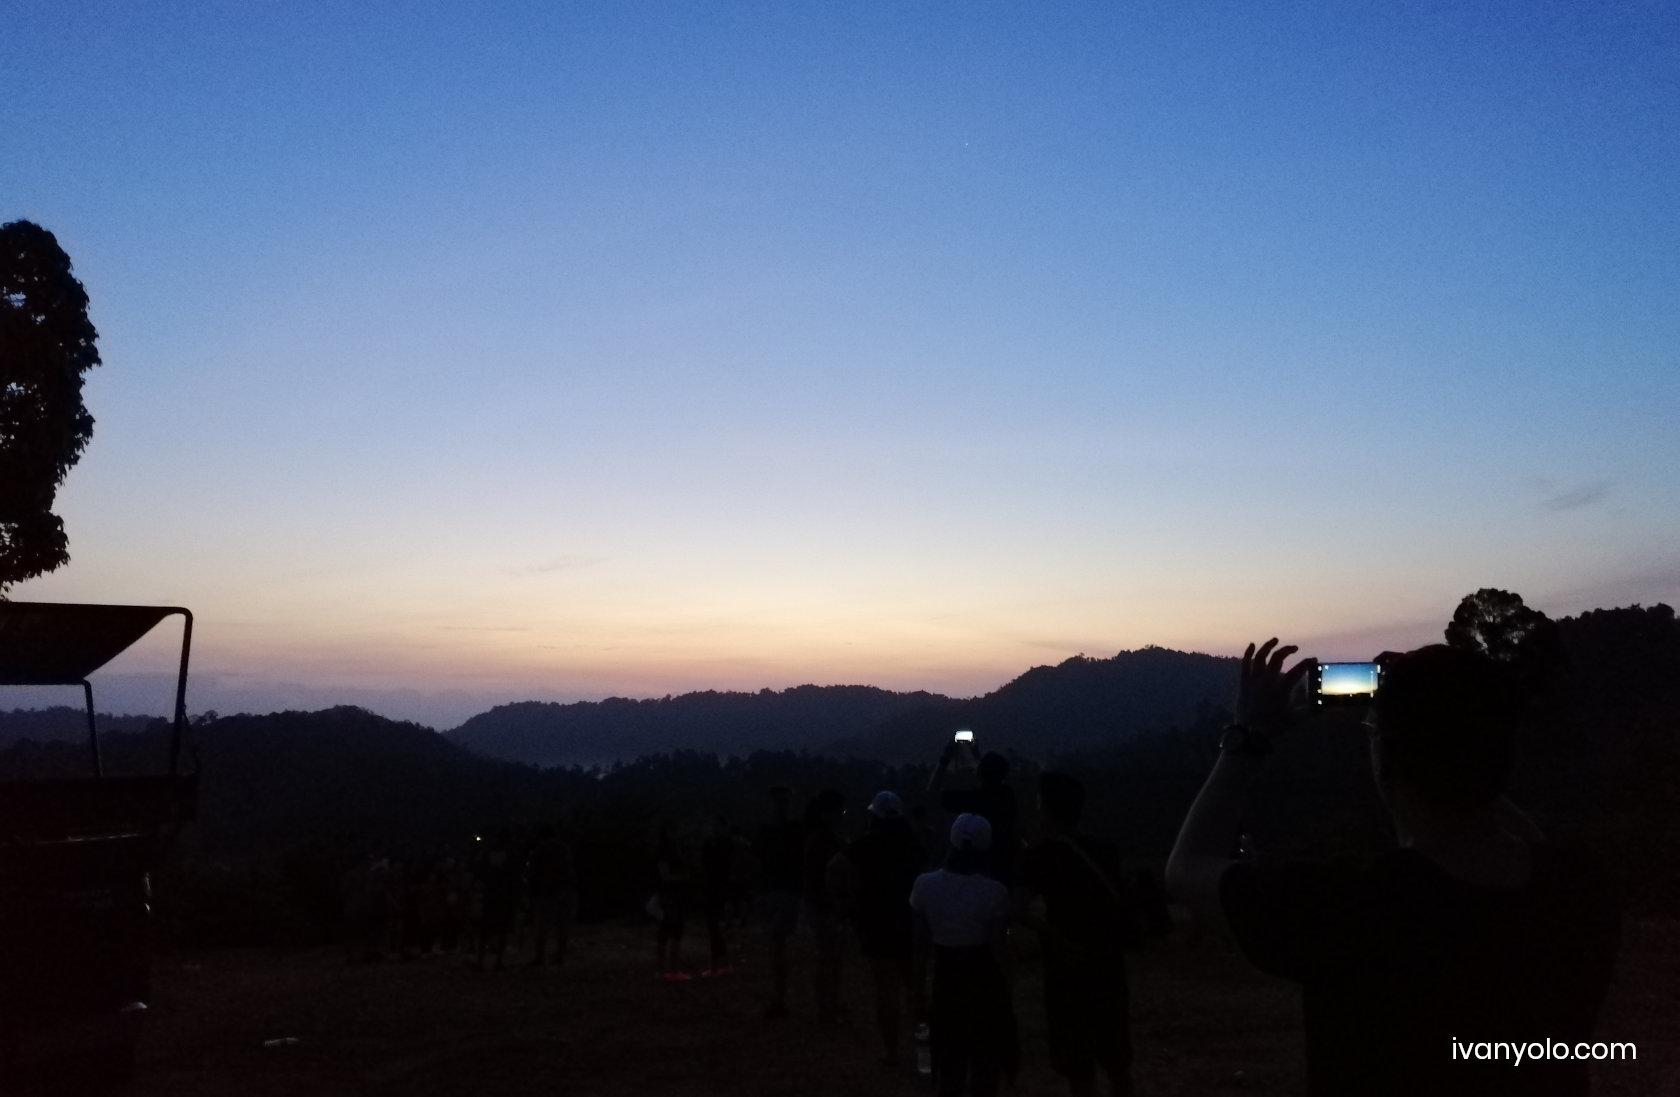 Sungai Lembing Sunrise Bukit Panorama